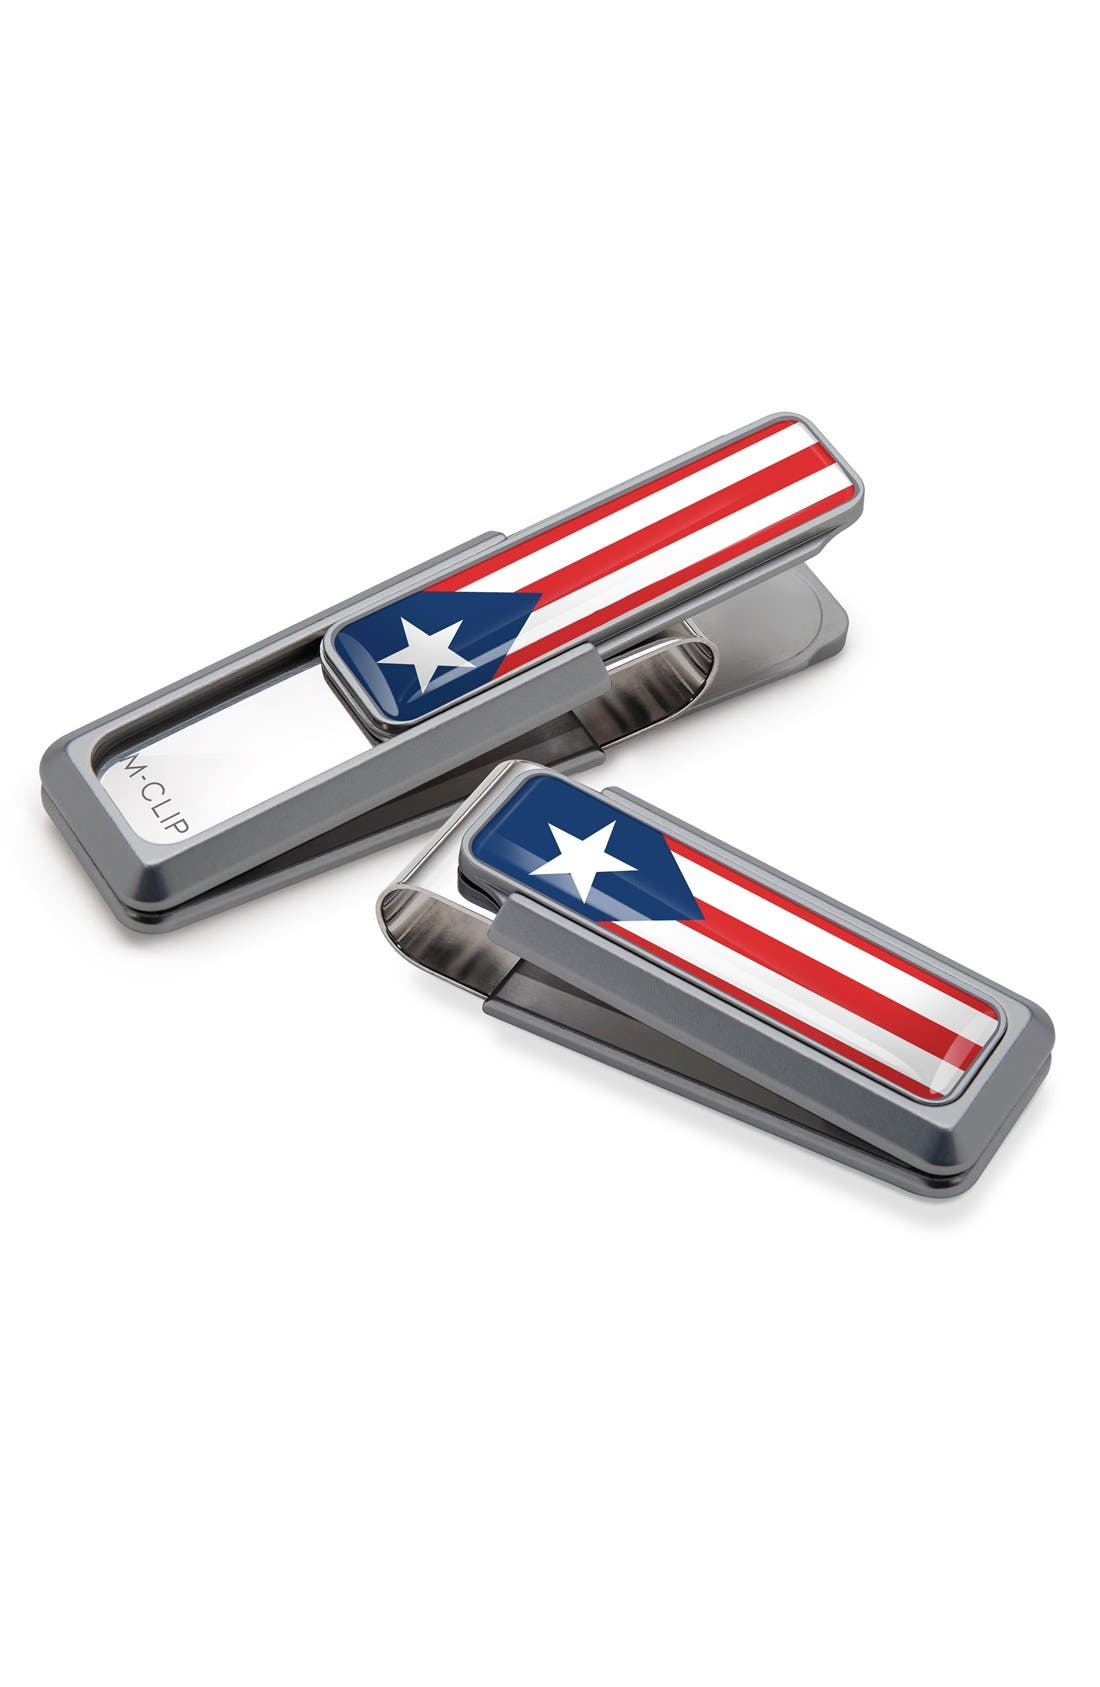 Main Image - M-Clip® Puerto Rican Flag Money Clip